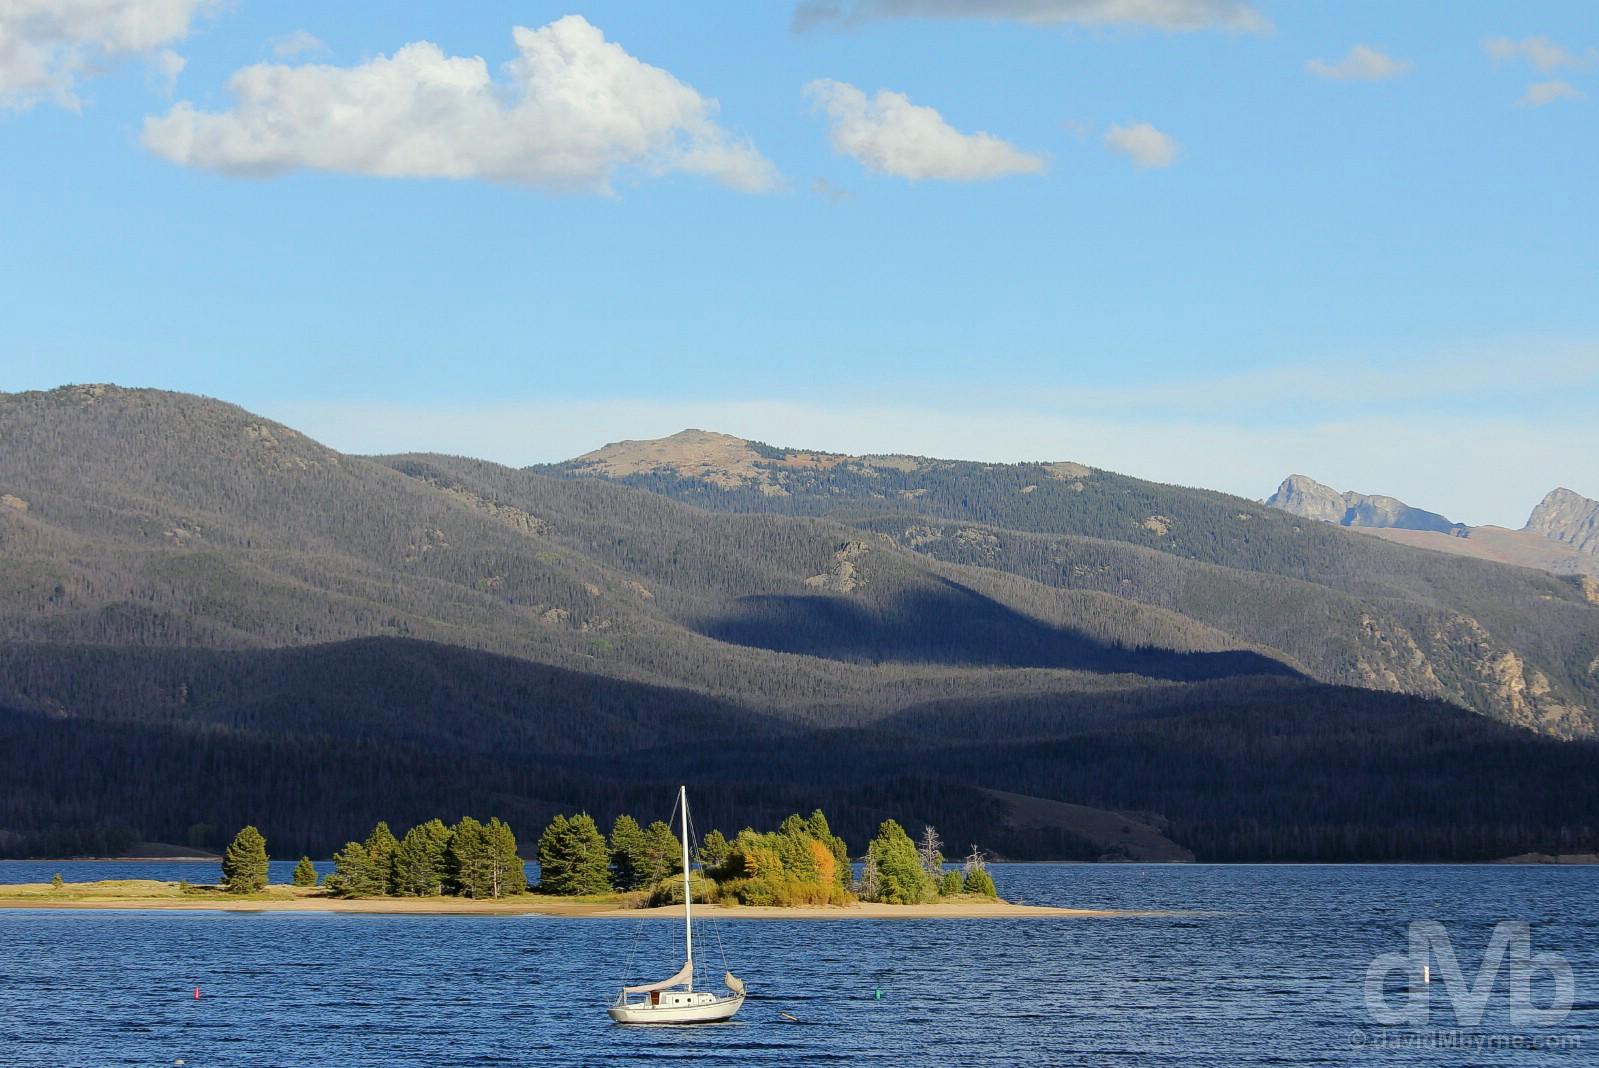 Lake Granby, north-central Colorado, USA. September 13, 2016.